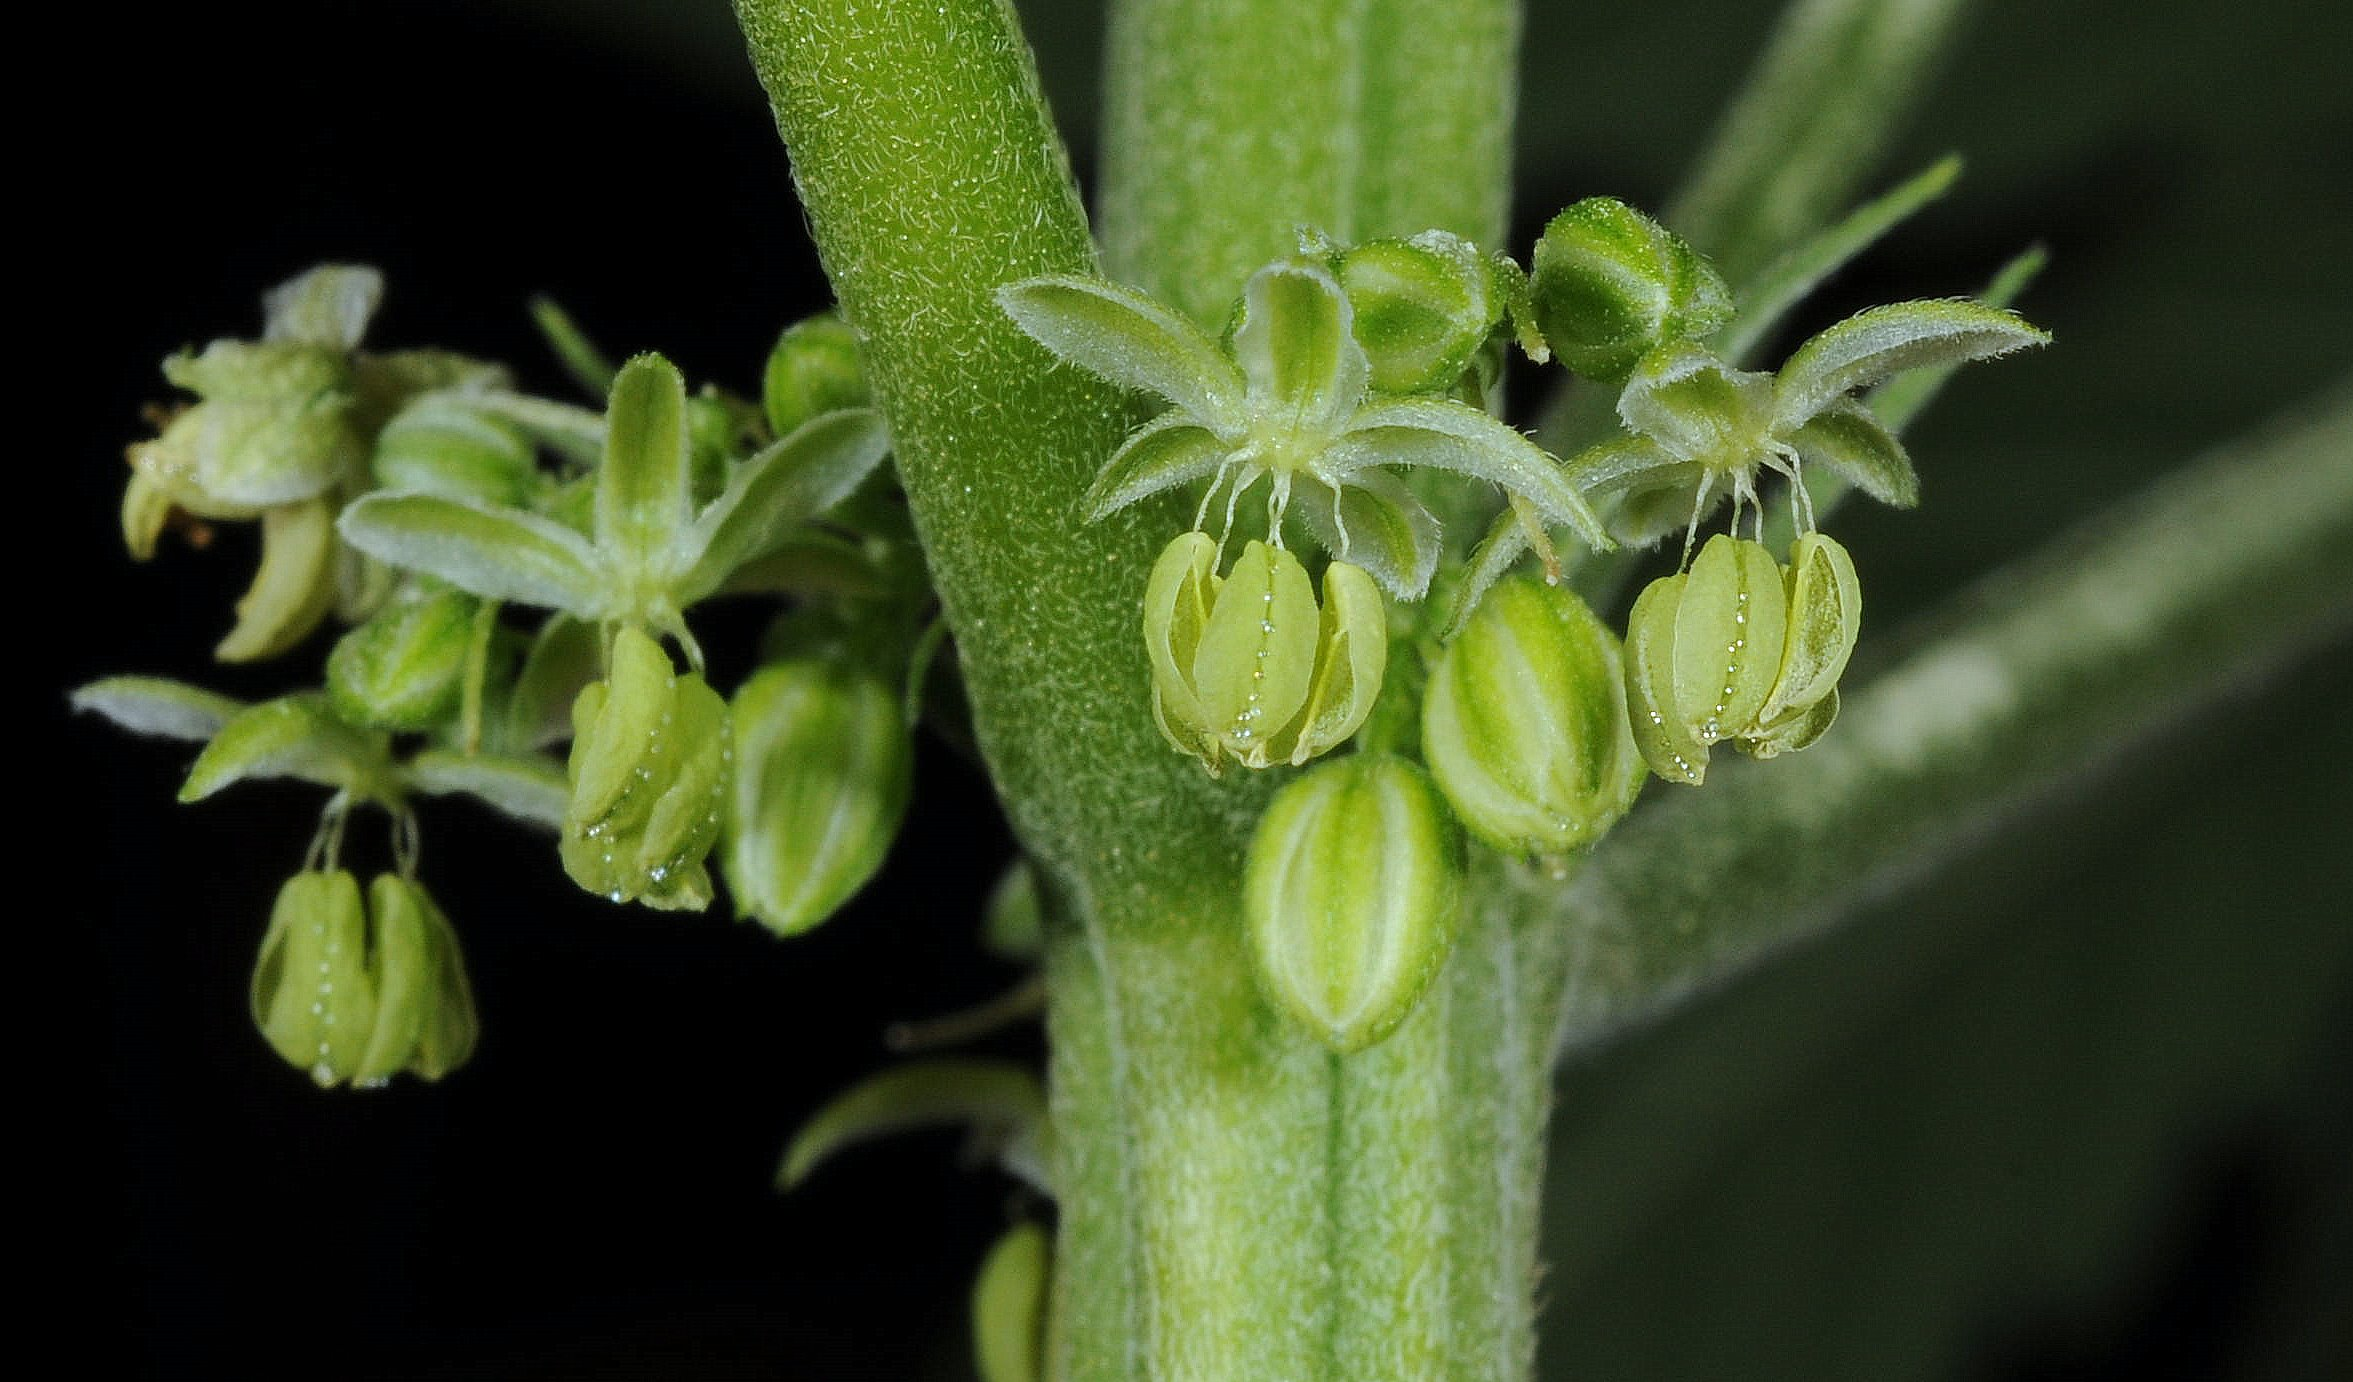 Male pollen